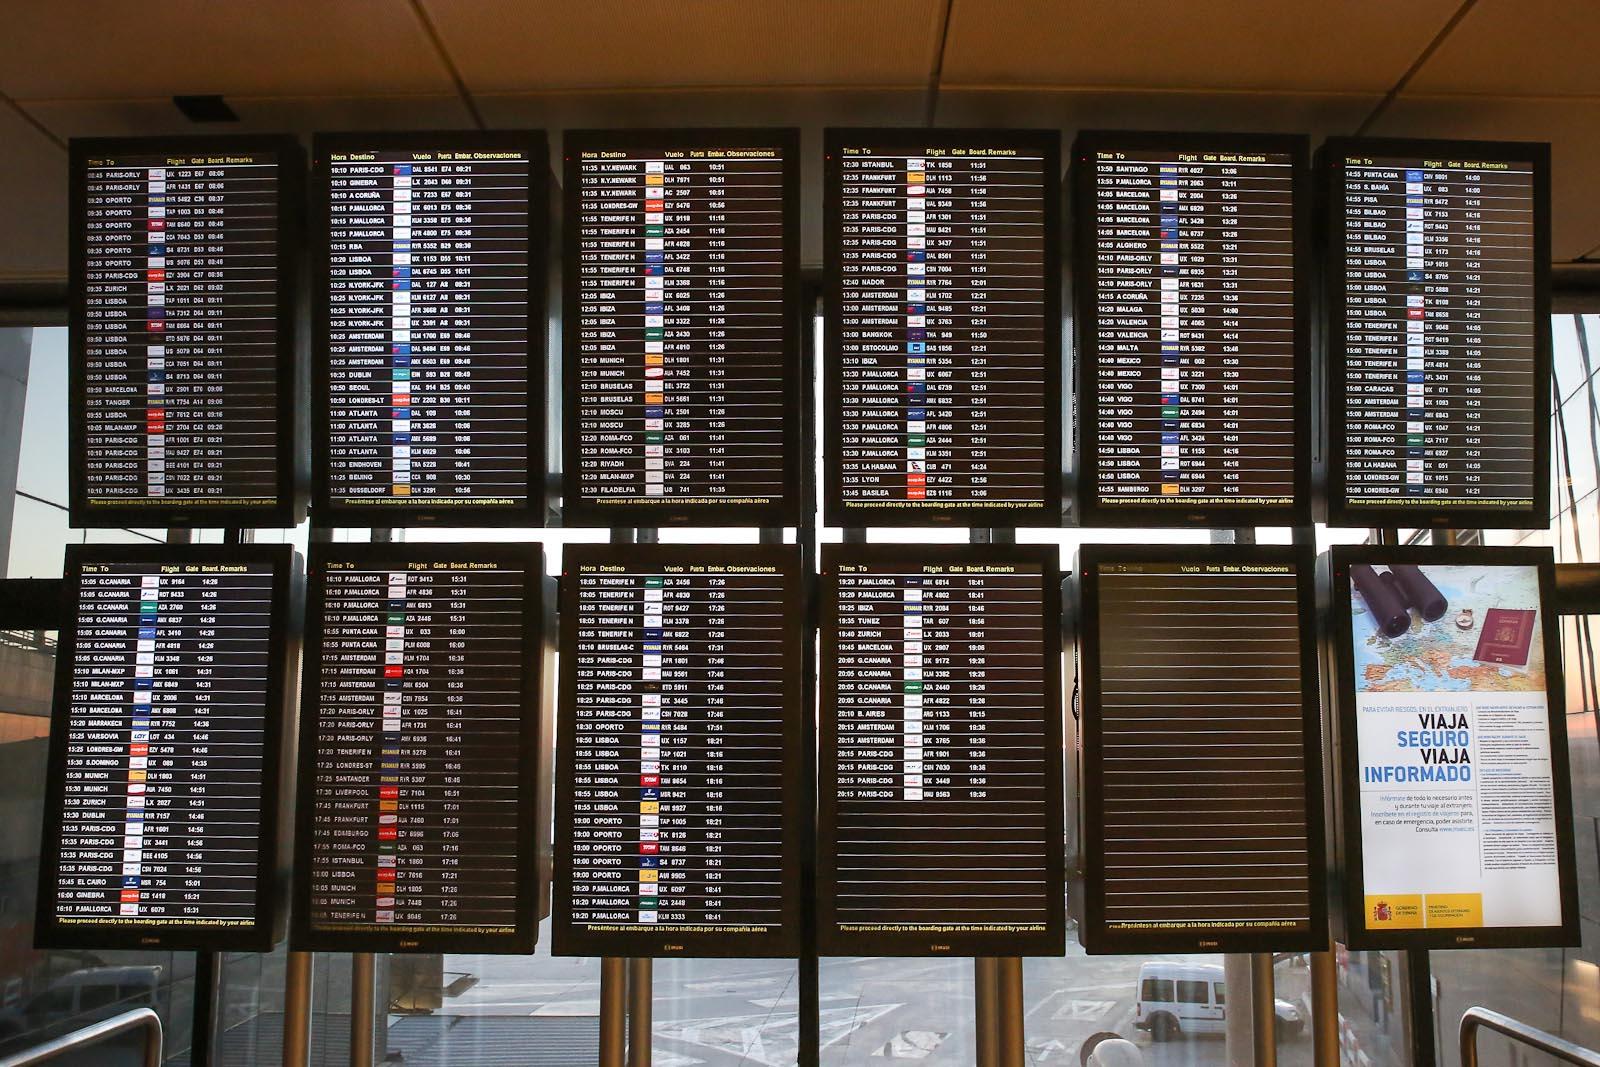 Табло аэропорта Барахас в Мадриде